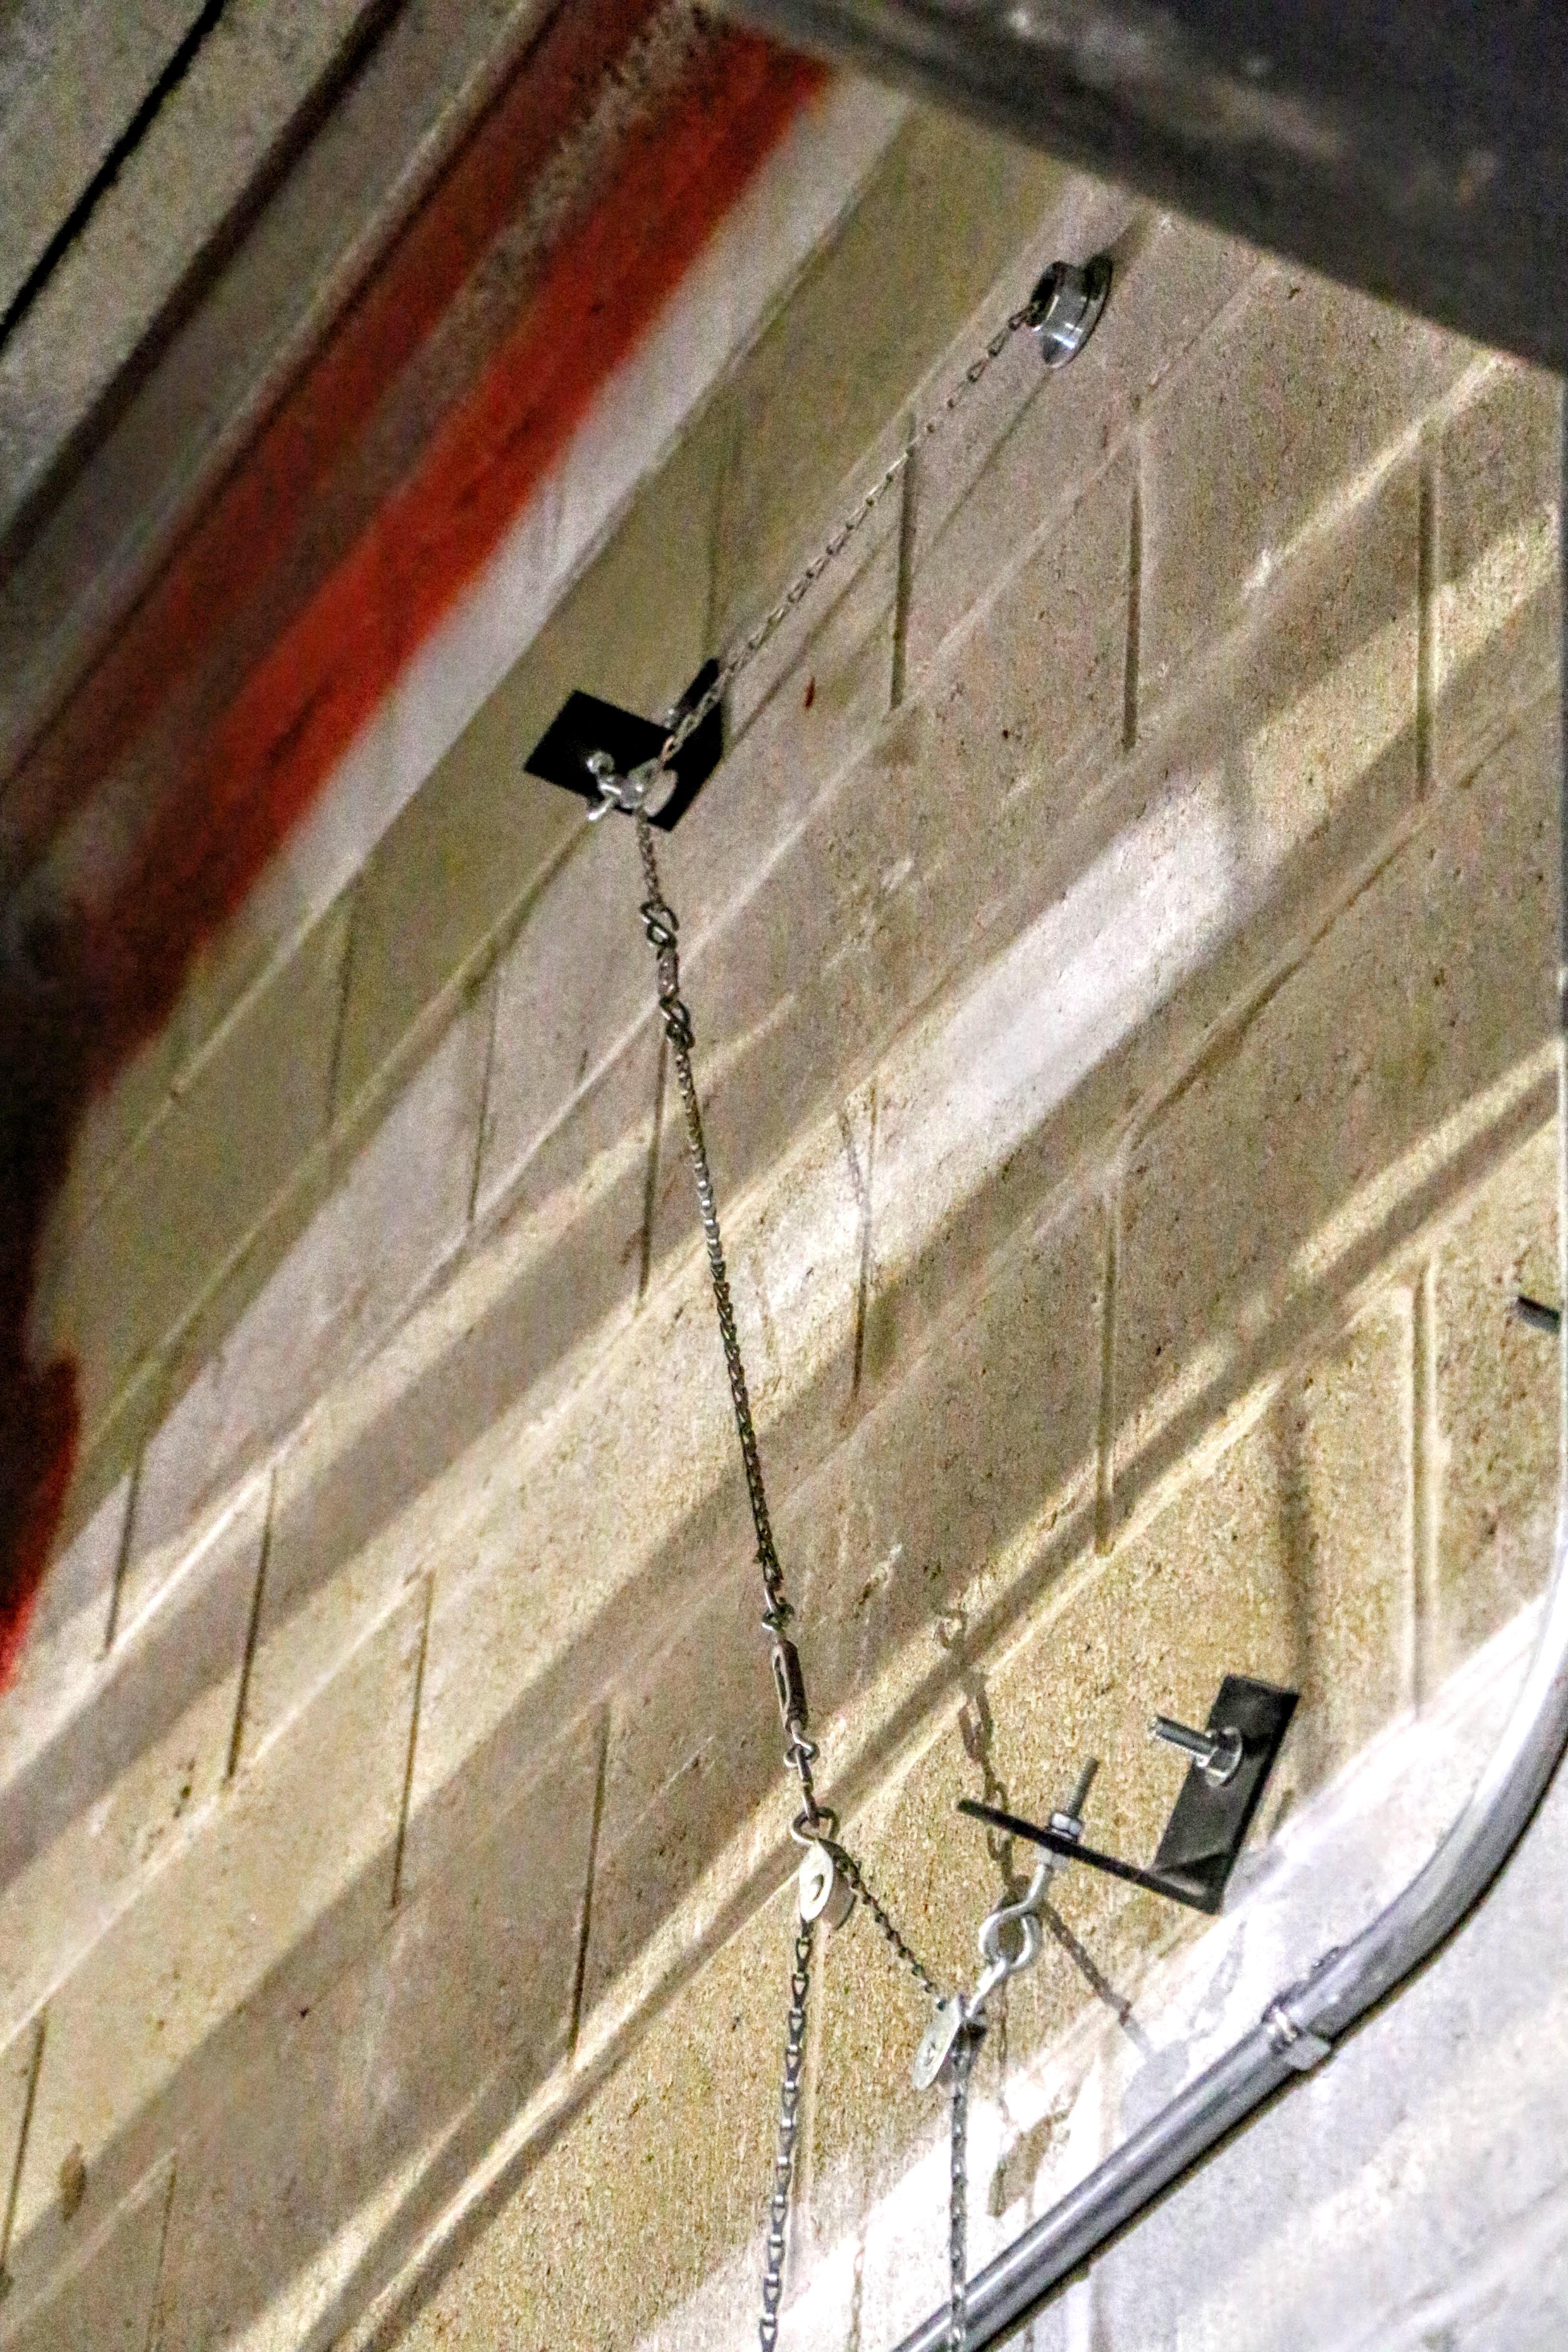 rolling fire door gate sash chain fusible link?t\\\=1508473713000\\\&width\\\=592\\\&name\\\=rolling fire door gate sash chain fusible link commercial overhead door wiring diagram overhead door rhx on overhead door rhx wiring diagram at arjmand.co